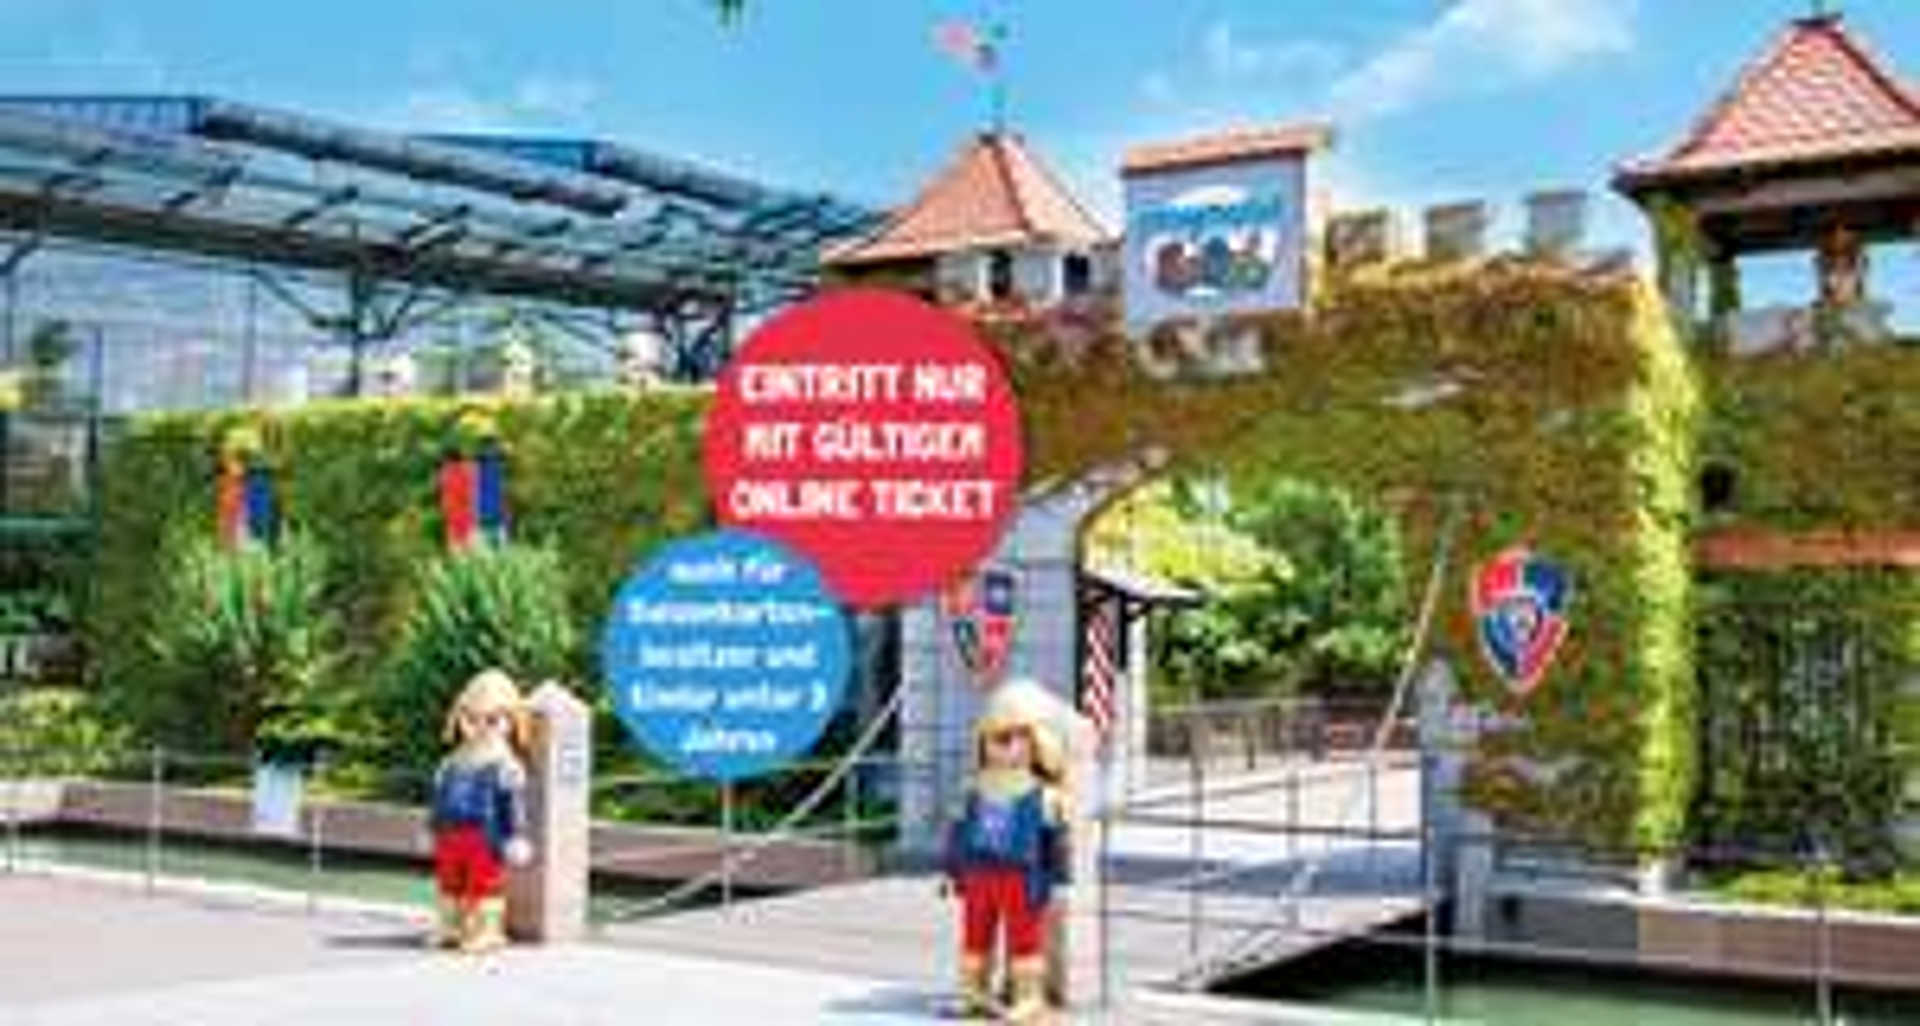 Playmobil Funpark dank OTTO UP Karte 2€ günstiger